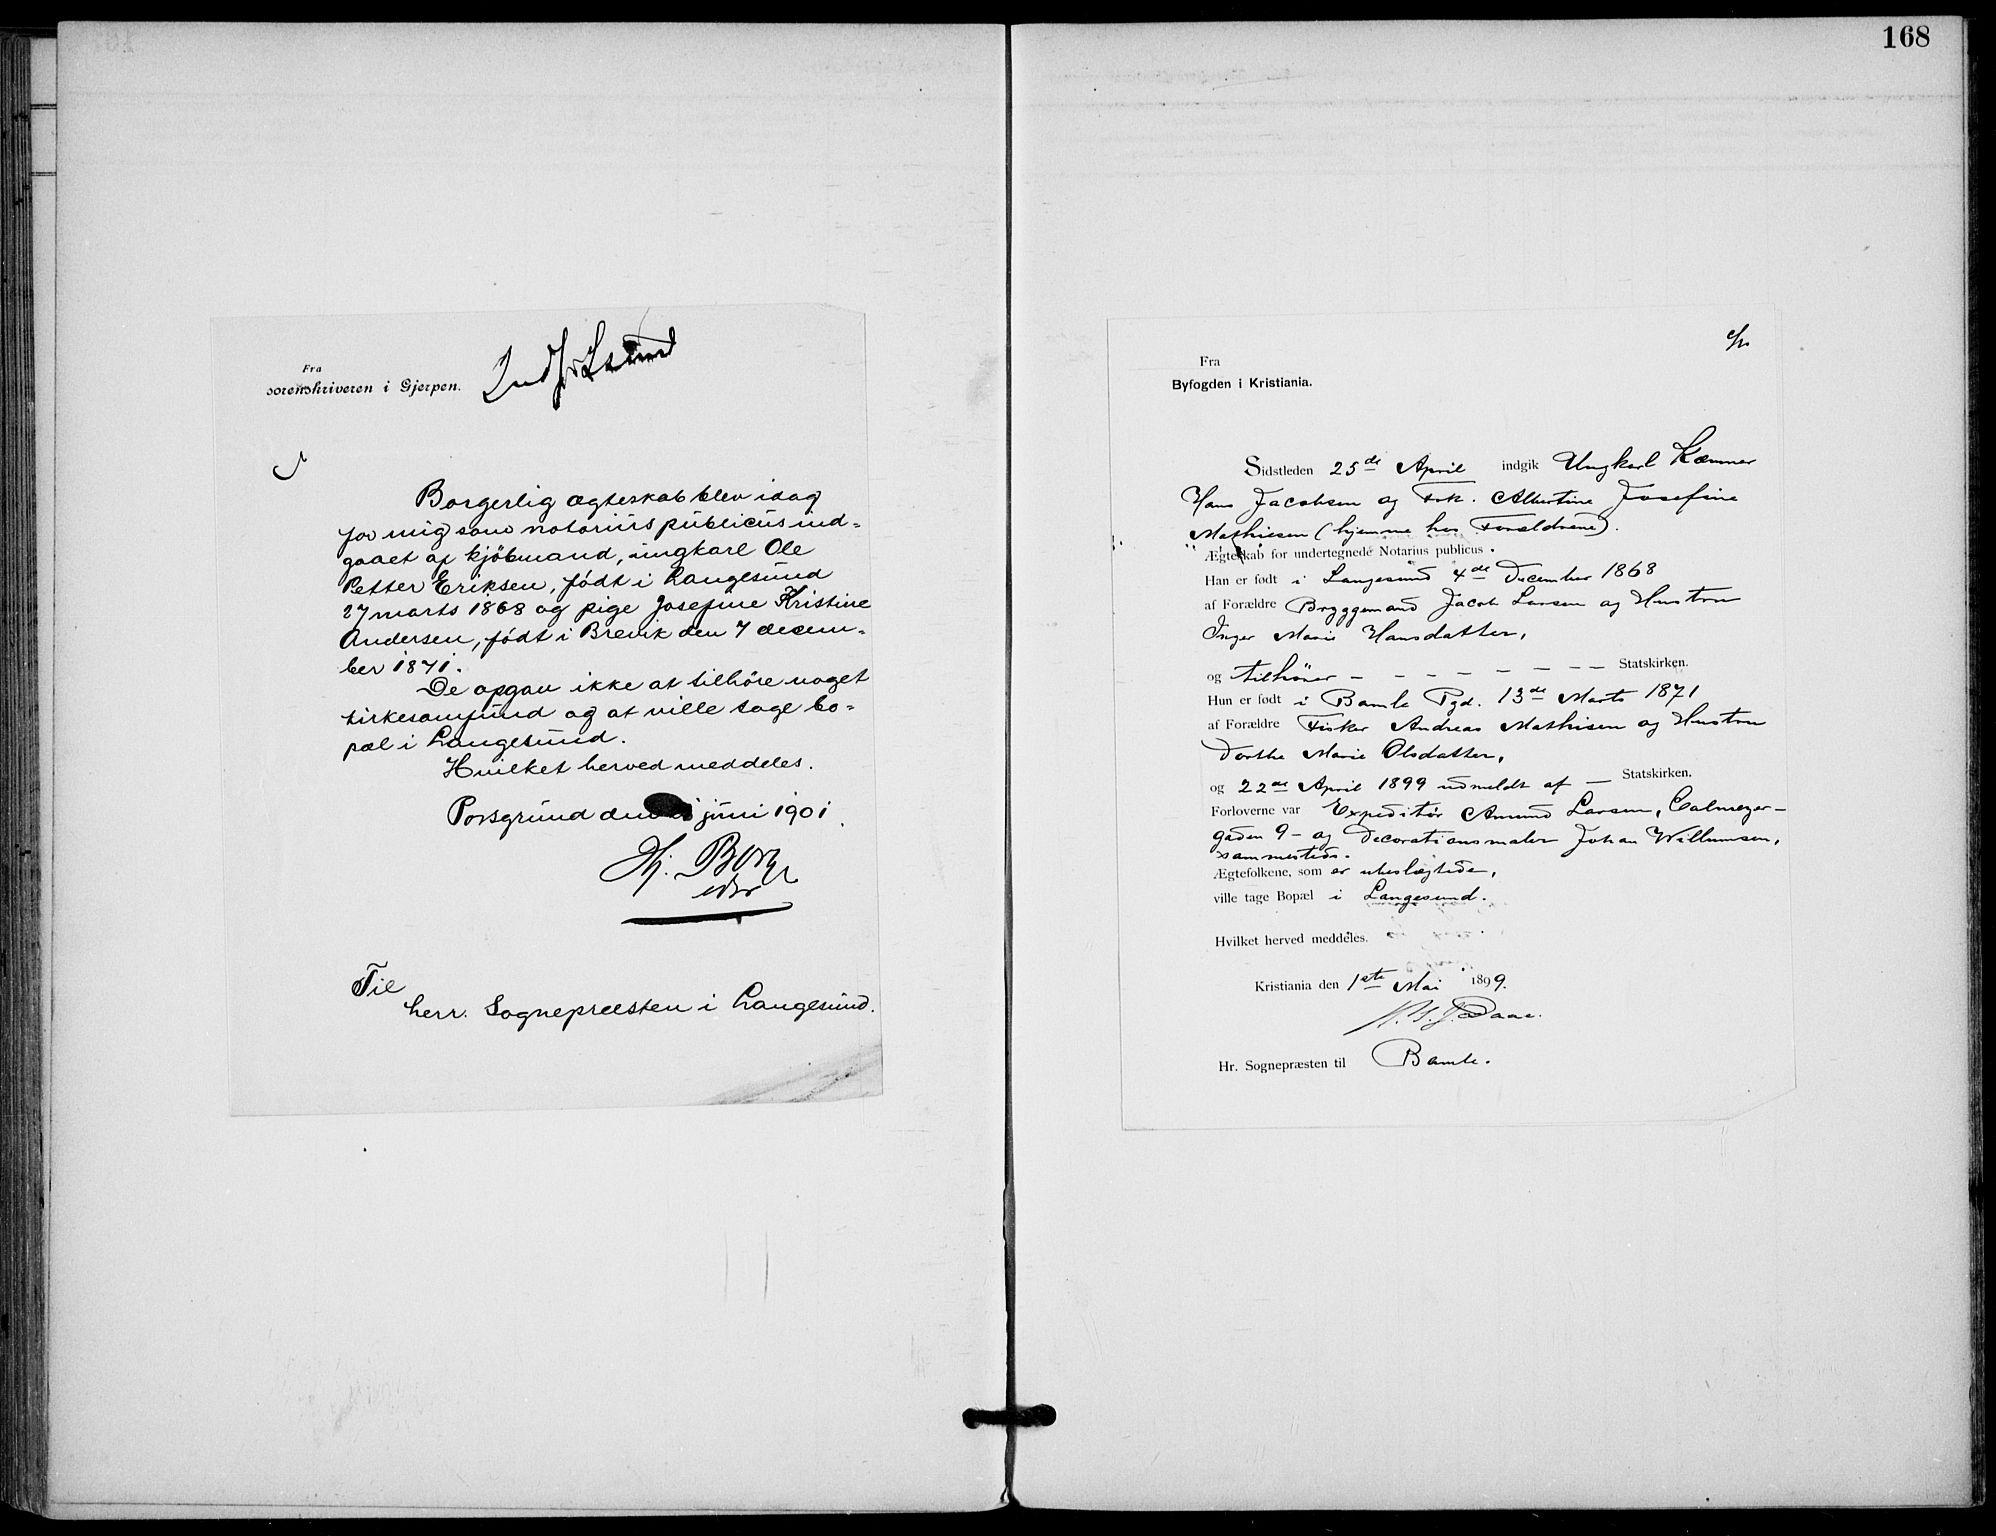 SAKO, Langesund kirkebøker, F/Fa/L0003: Ministerialbok nr. 3, 1893-1907, s. 168